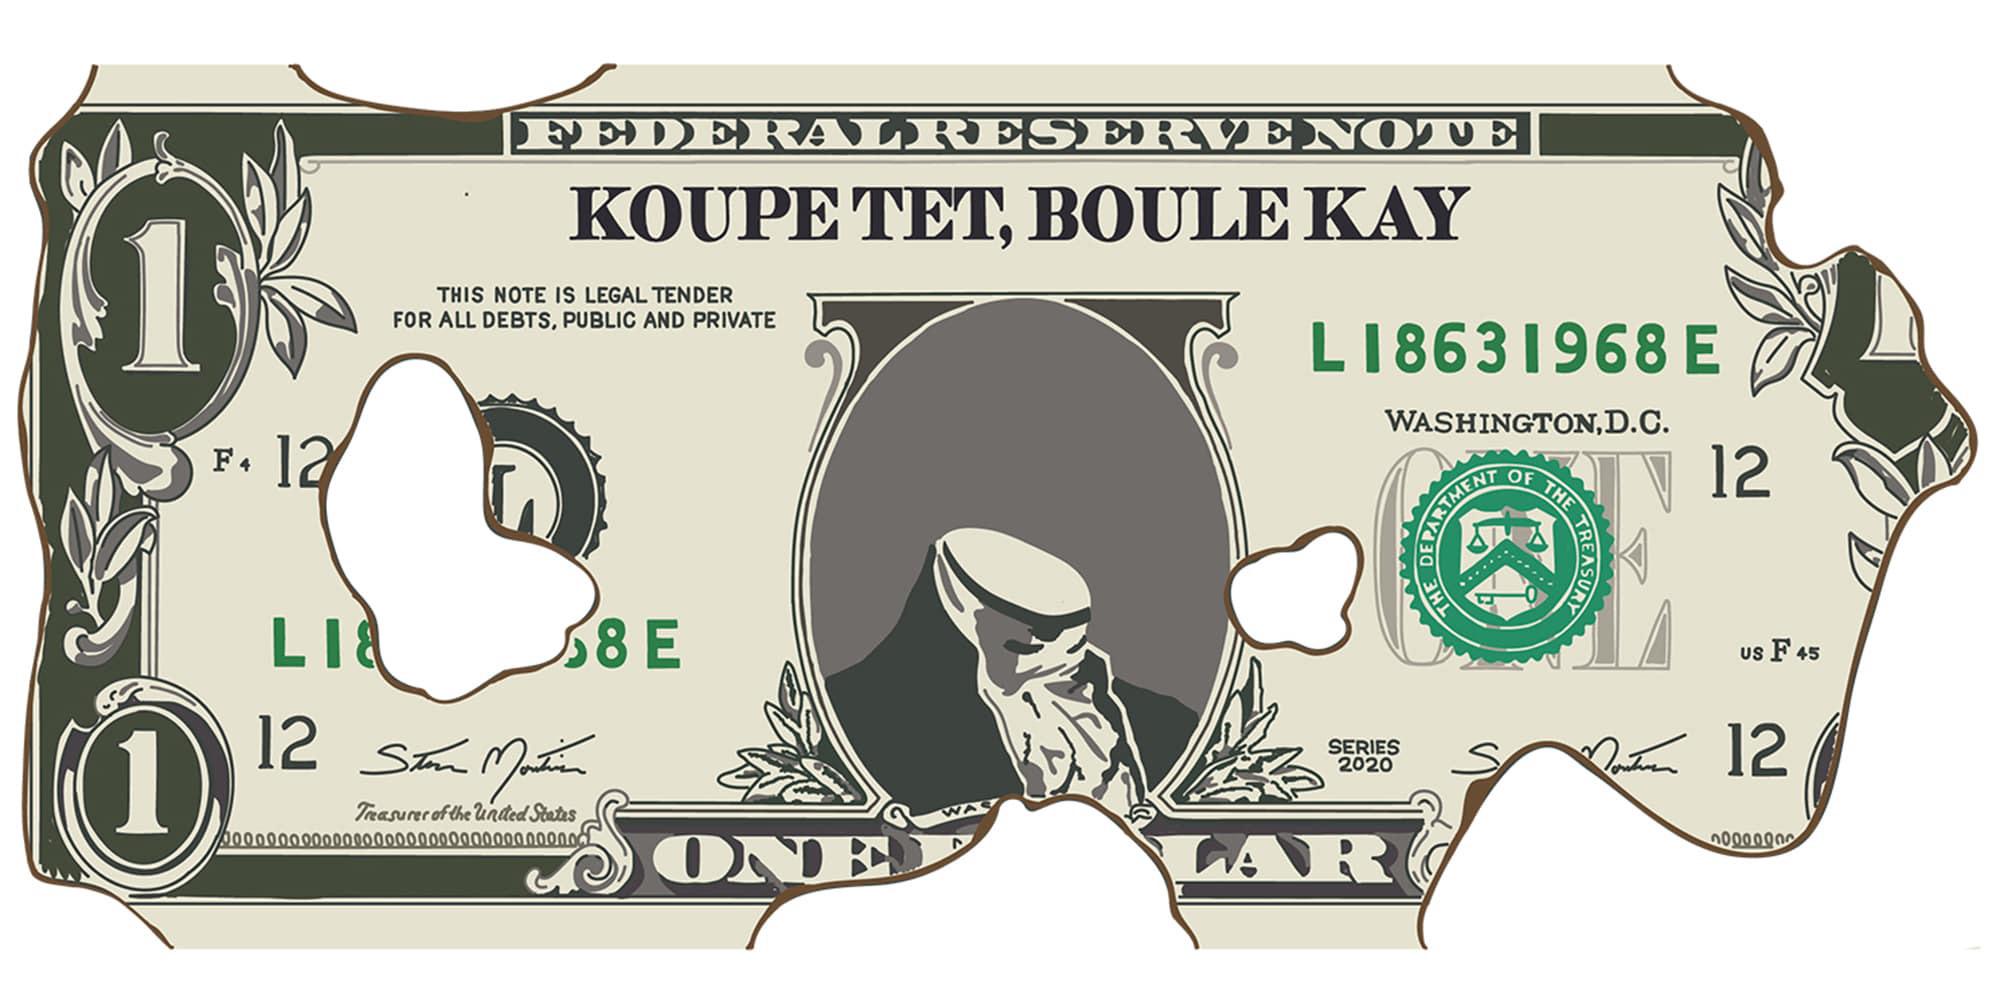 steven-montinar-koupe-tet-boule-kay-900x450.jpg